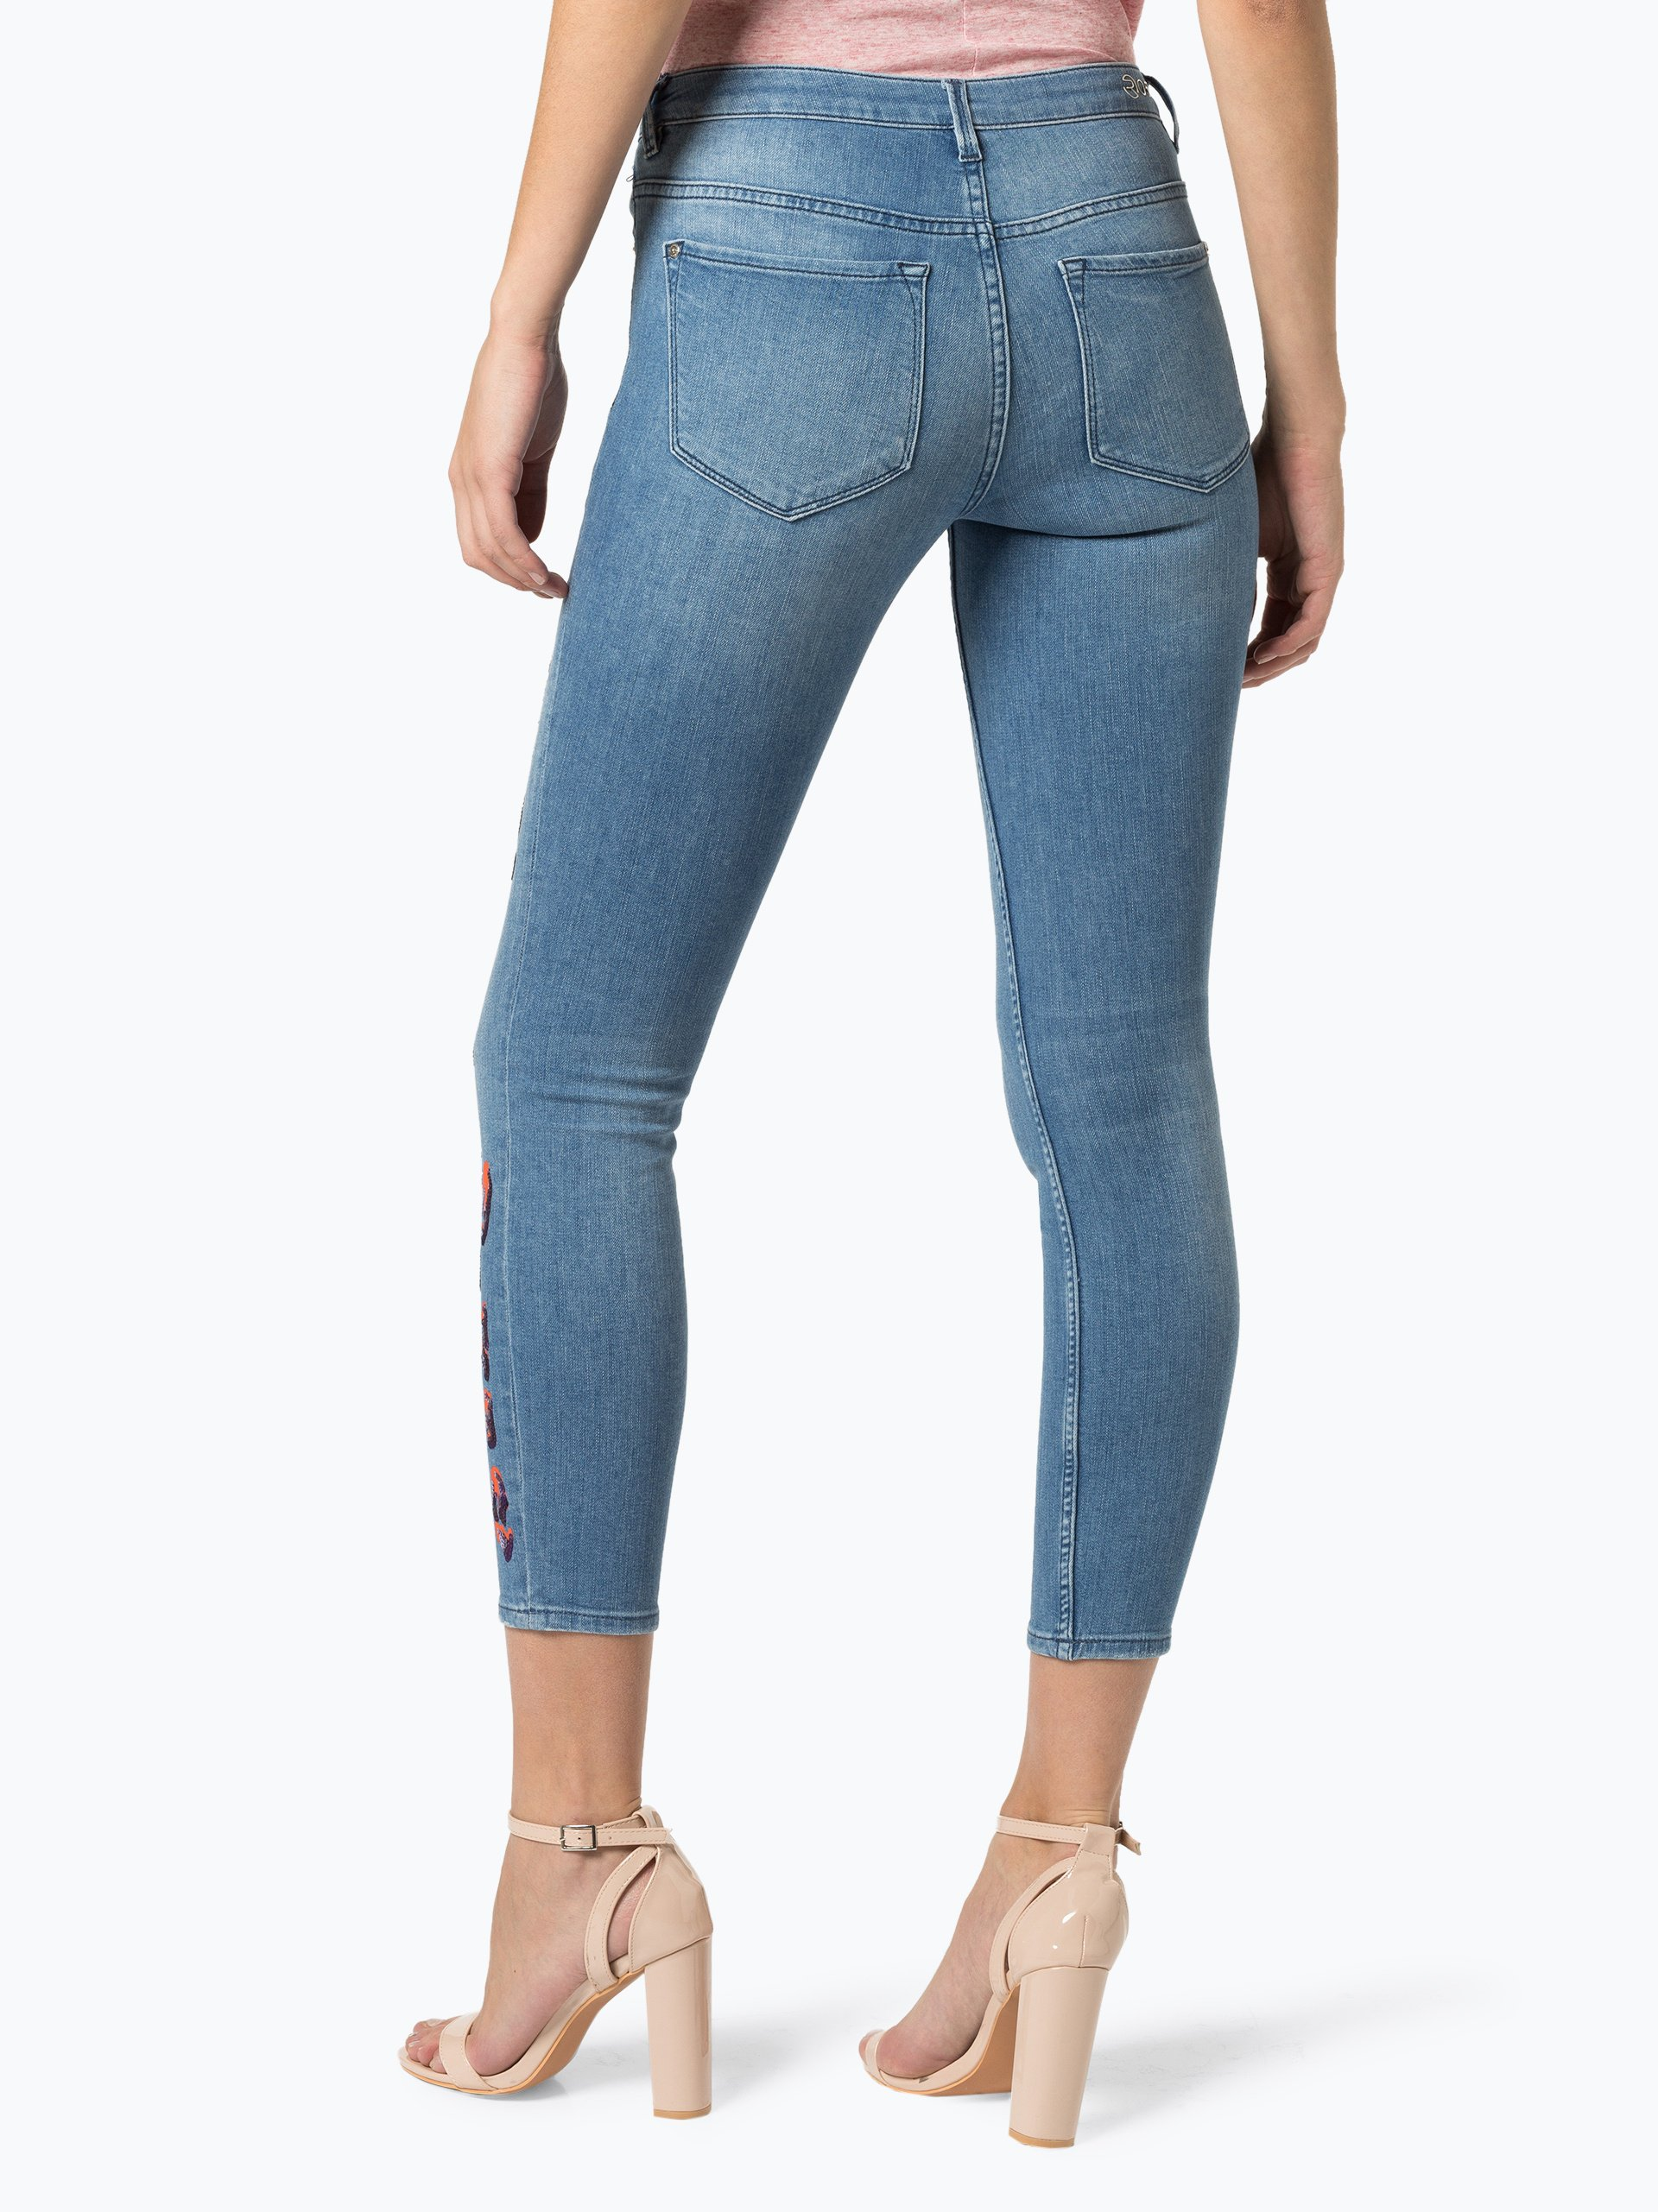 Rosner Damen Jeans - Antonia